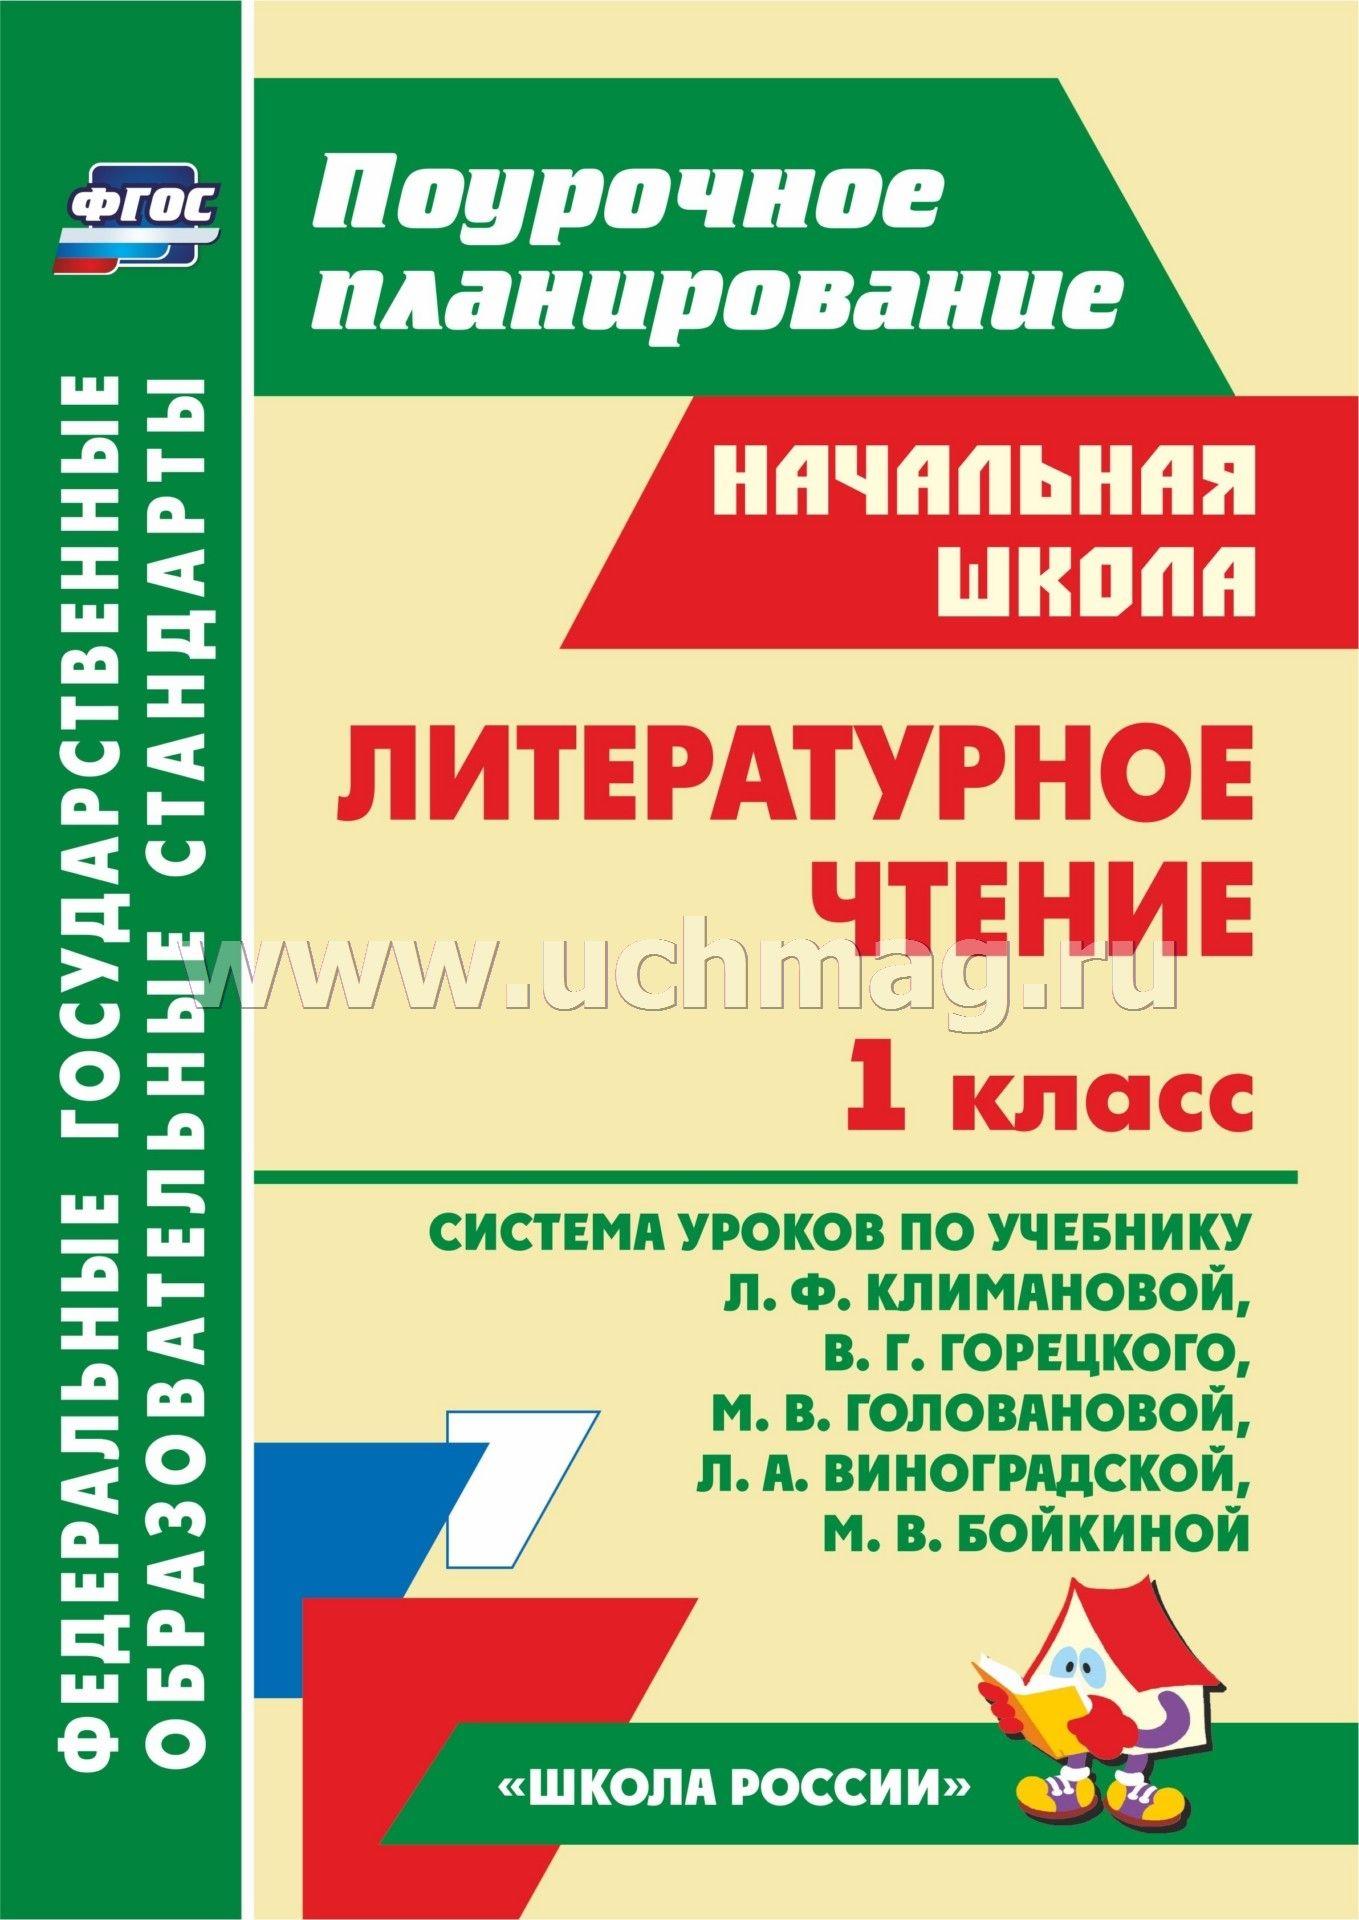 Гдз по русскому языку экспресс диагностика 6 класс н.м девятова е.ю геймбух